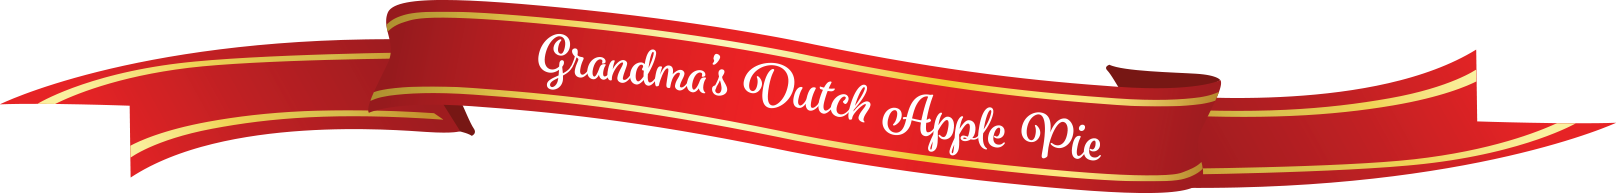 VaporFi Grandma's Dutch Apple Pie